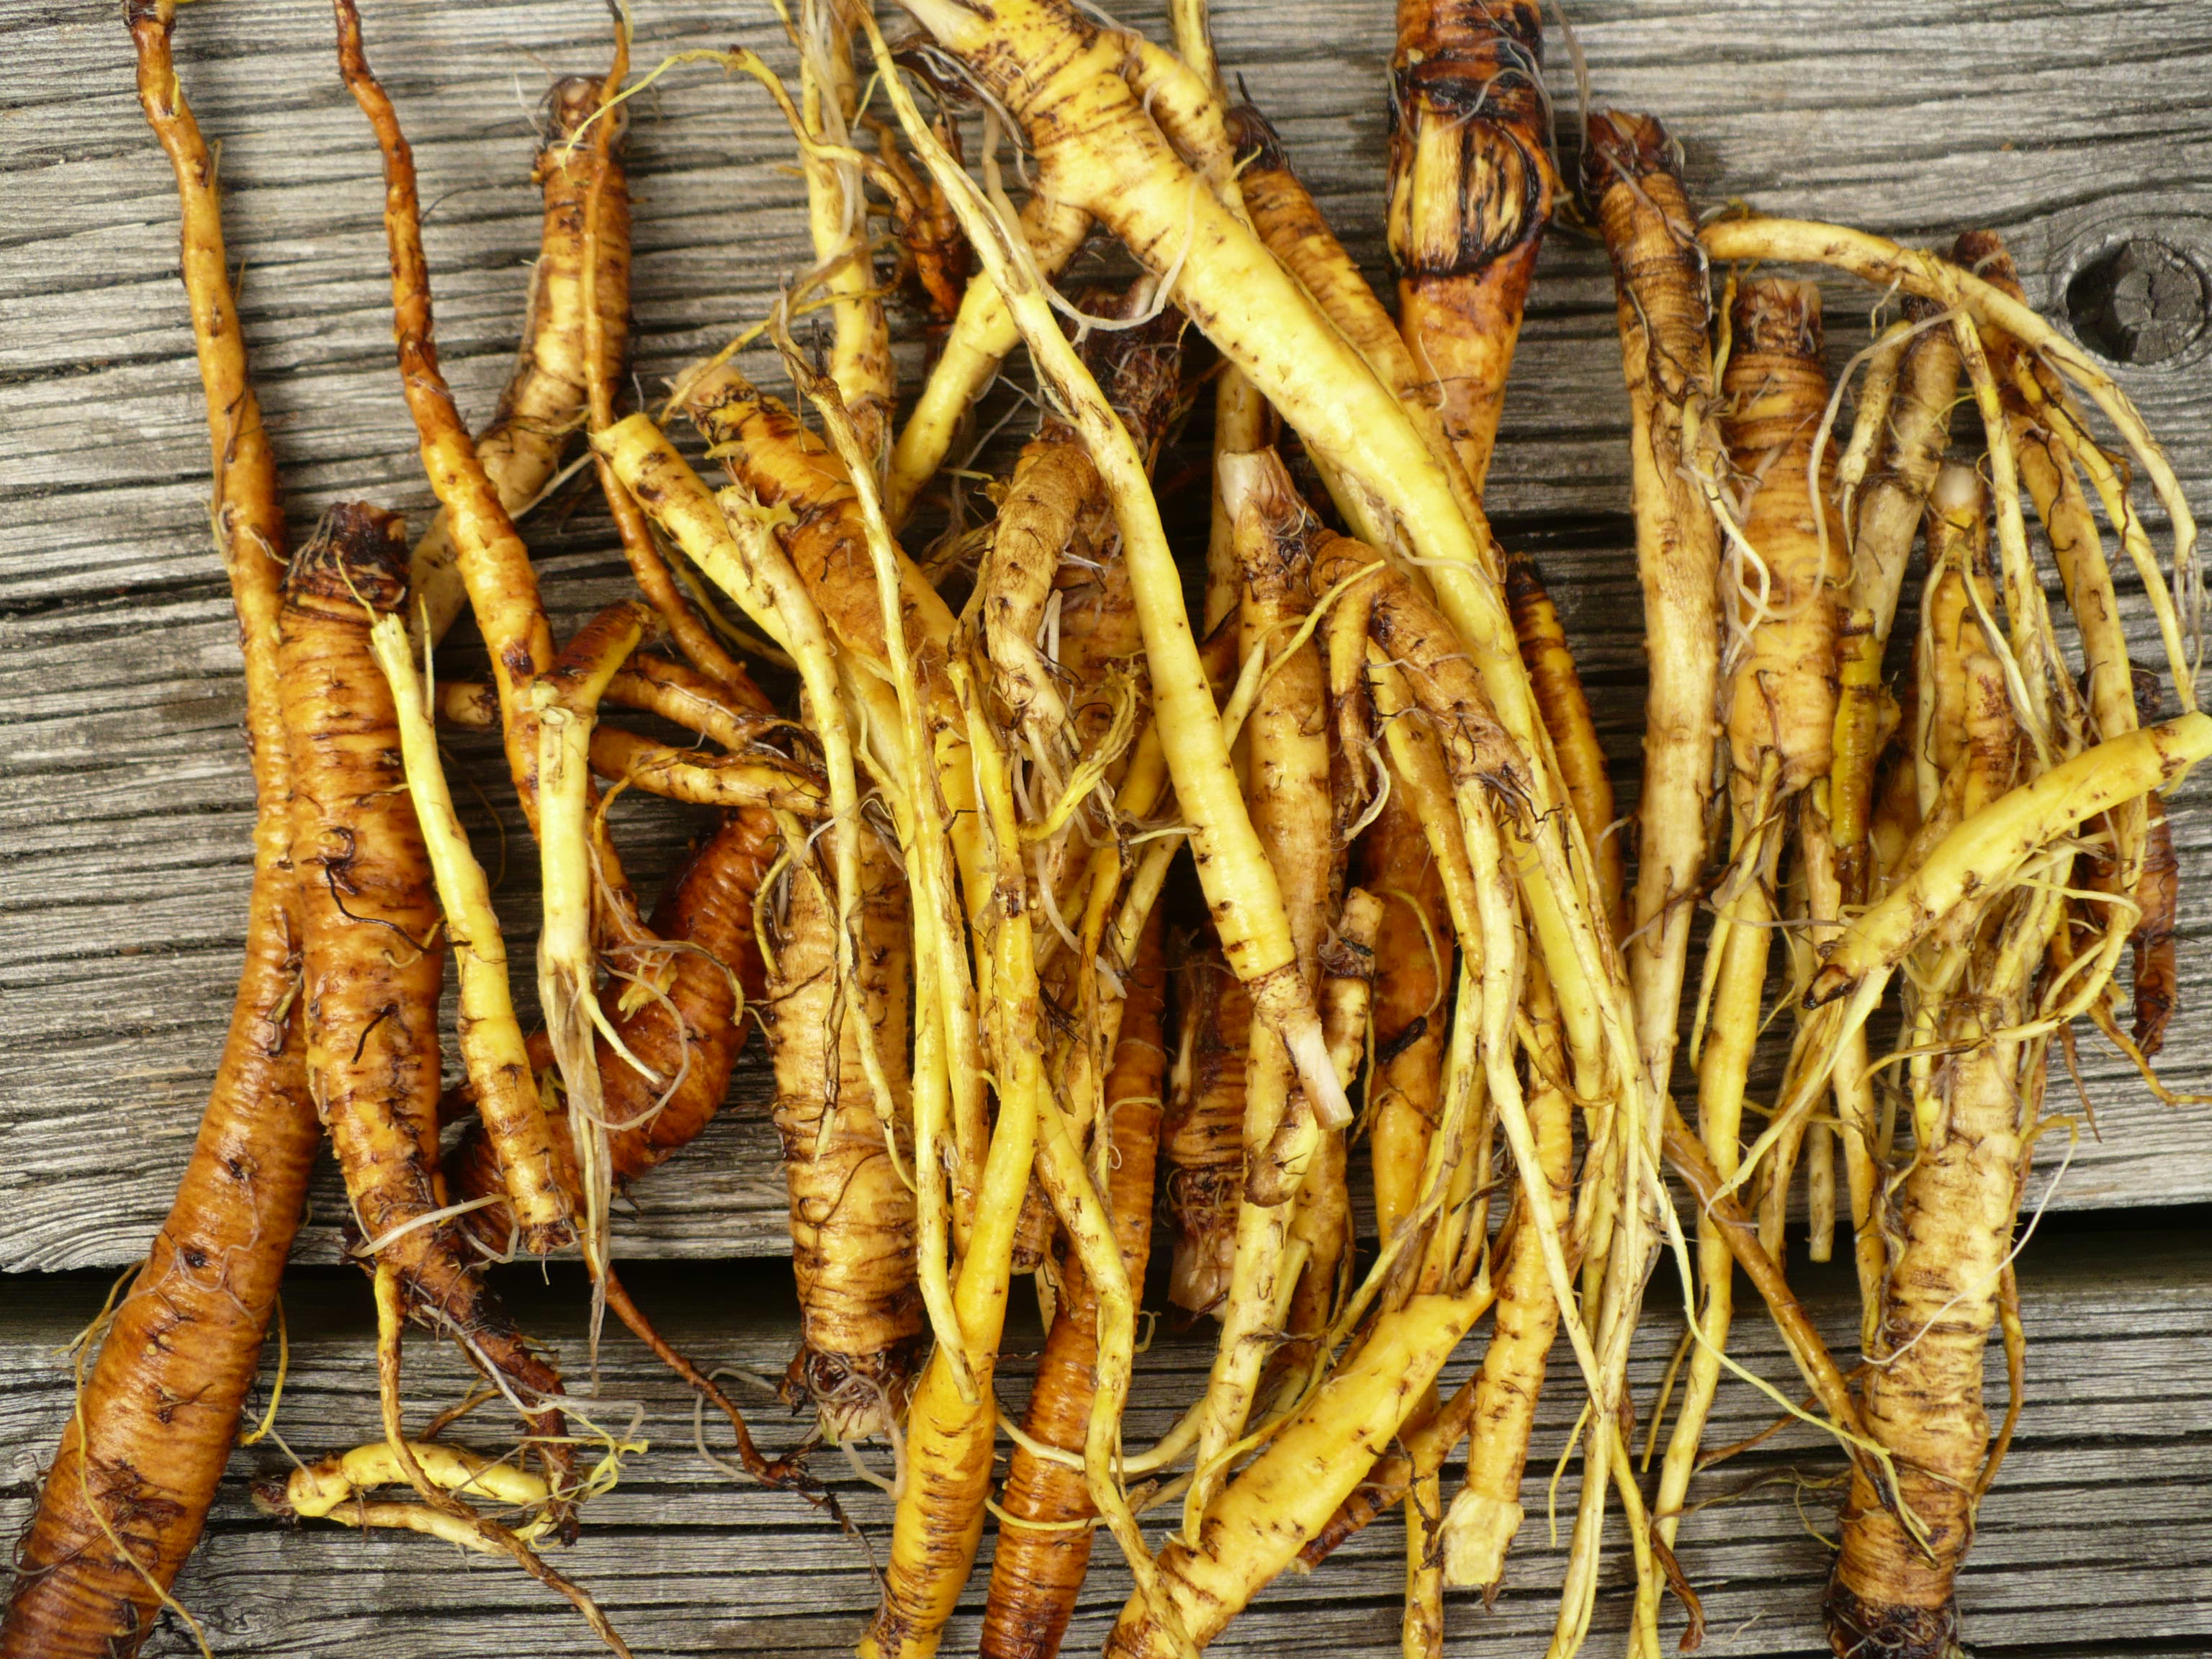 yellow dock root